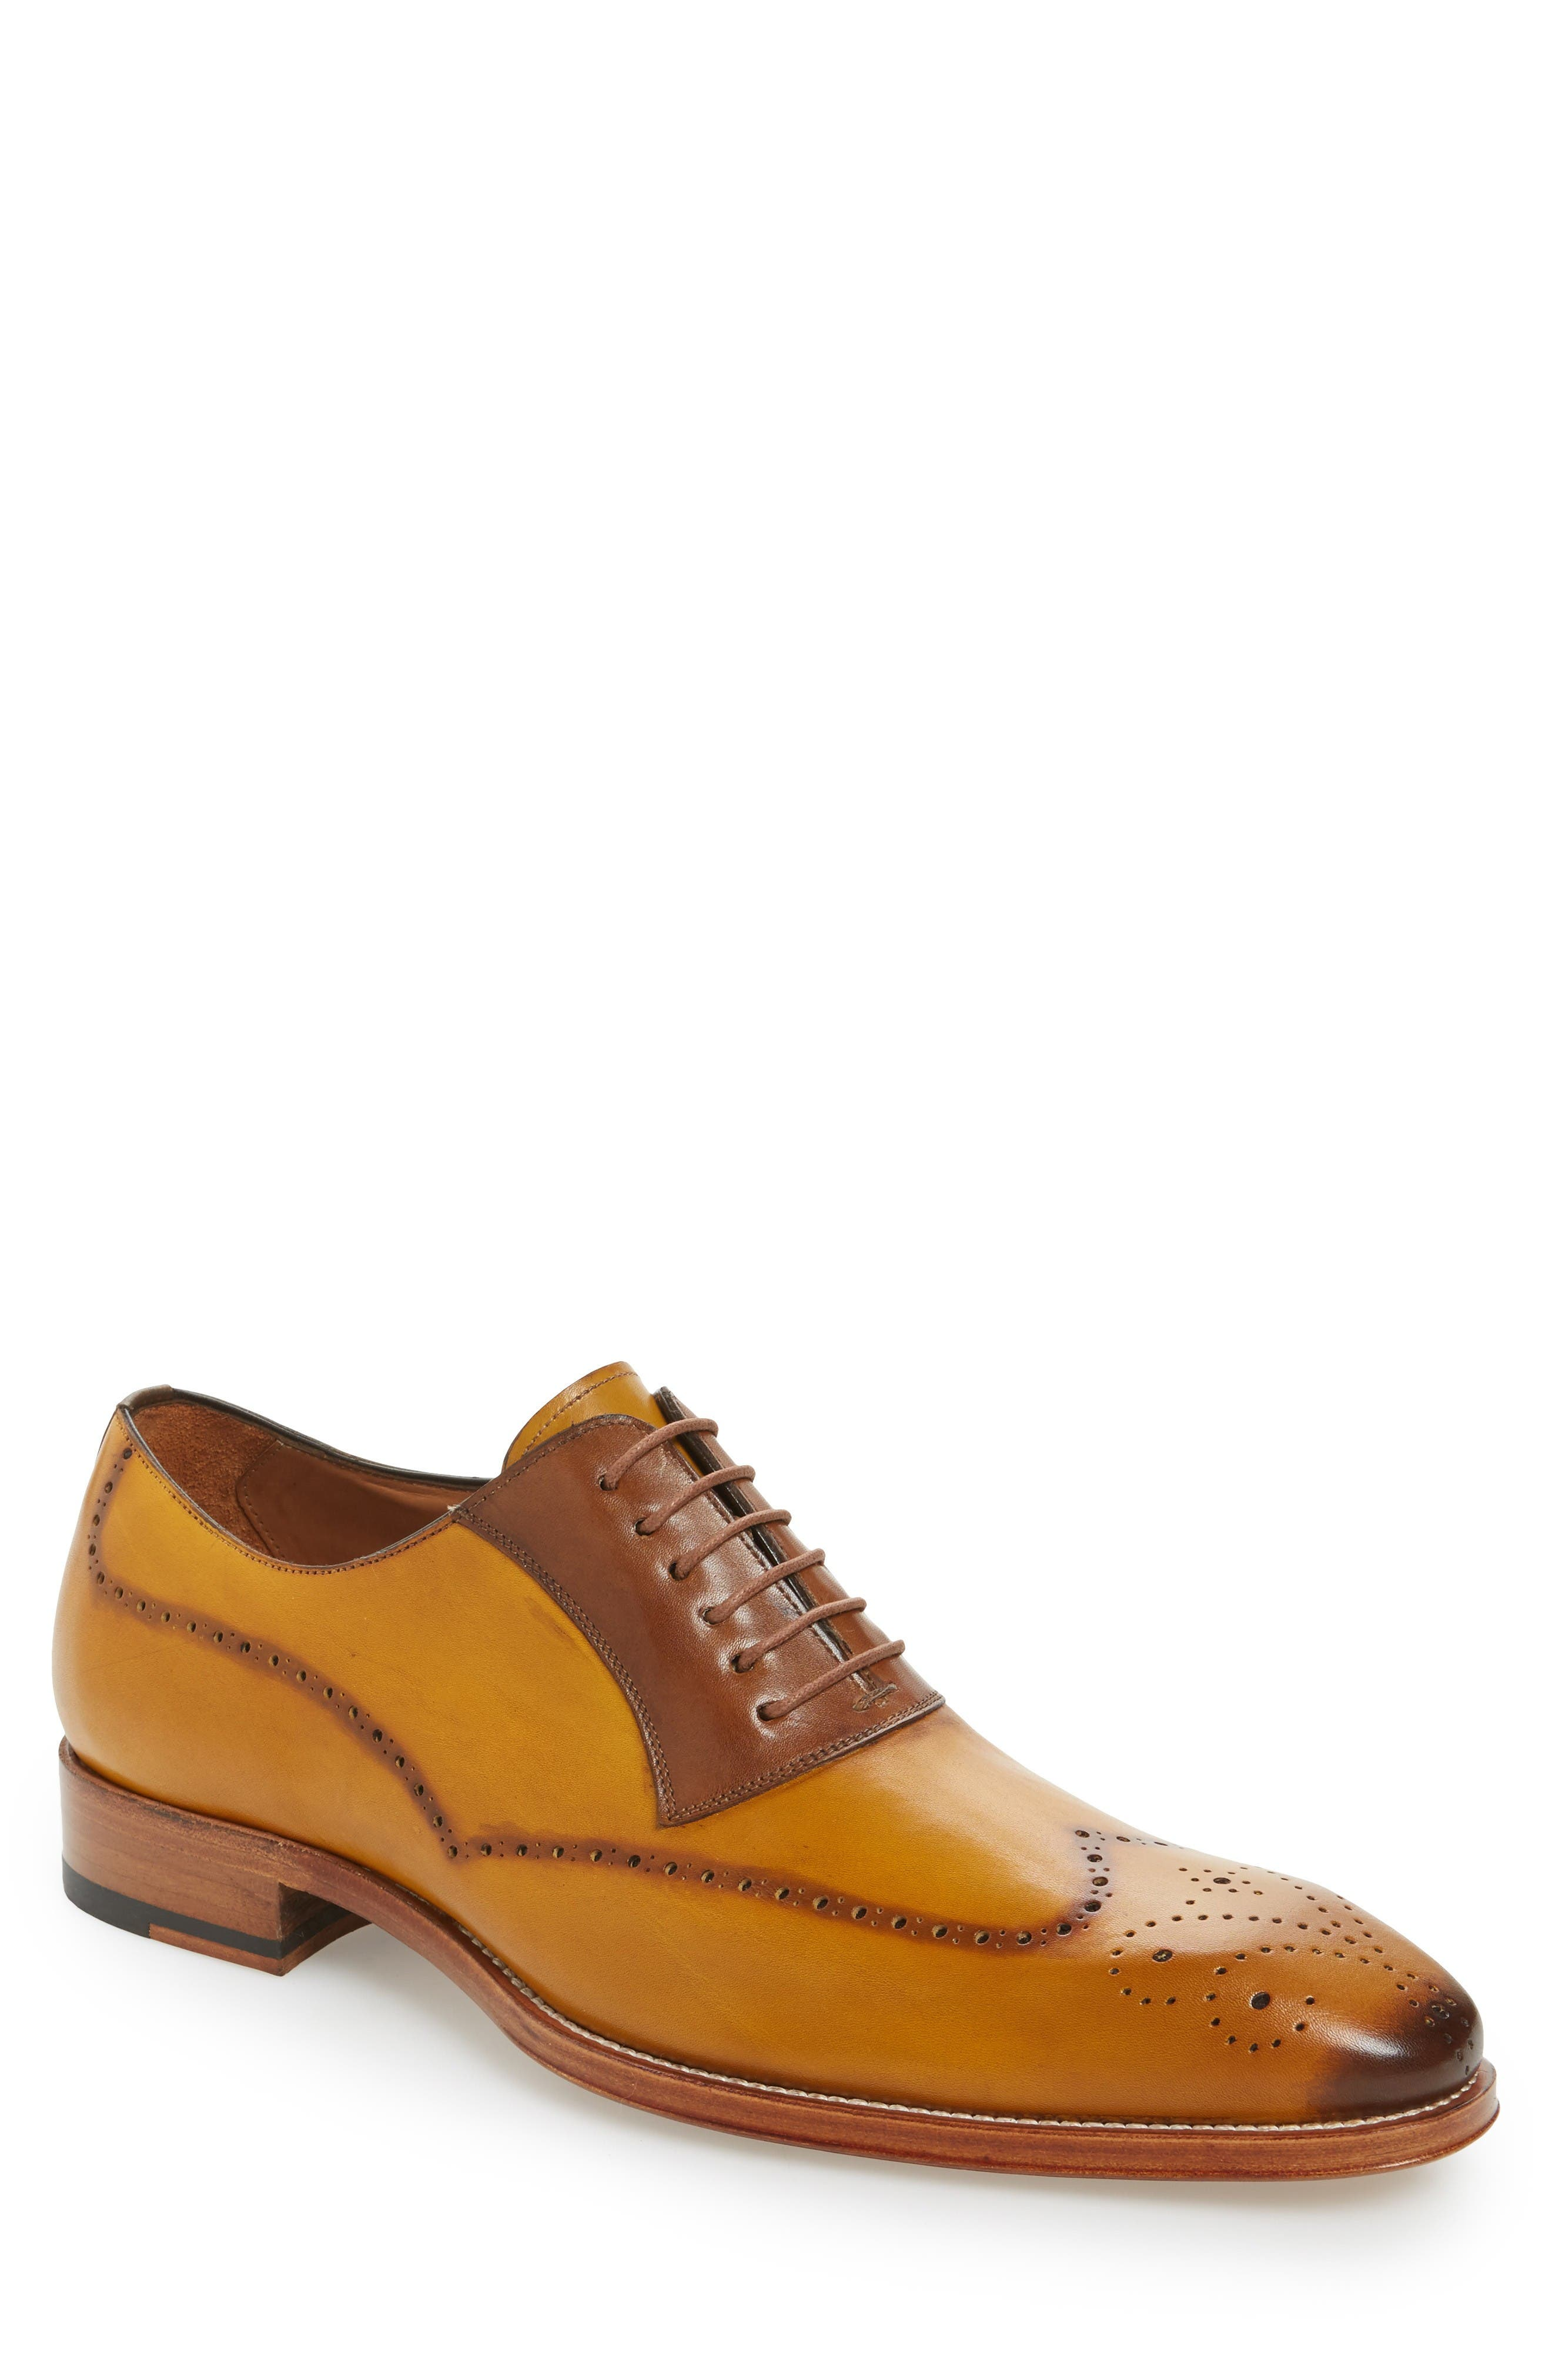 Kelvin Faux Wingtip,                         Main,                         color, Mustard/ Tan Leather